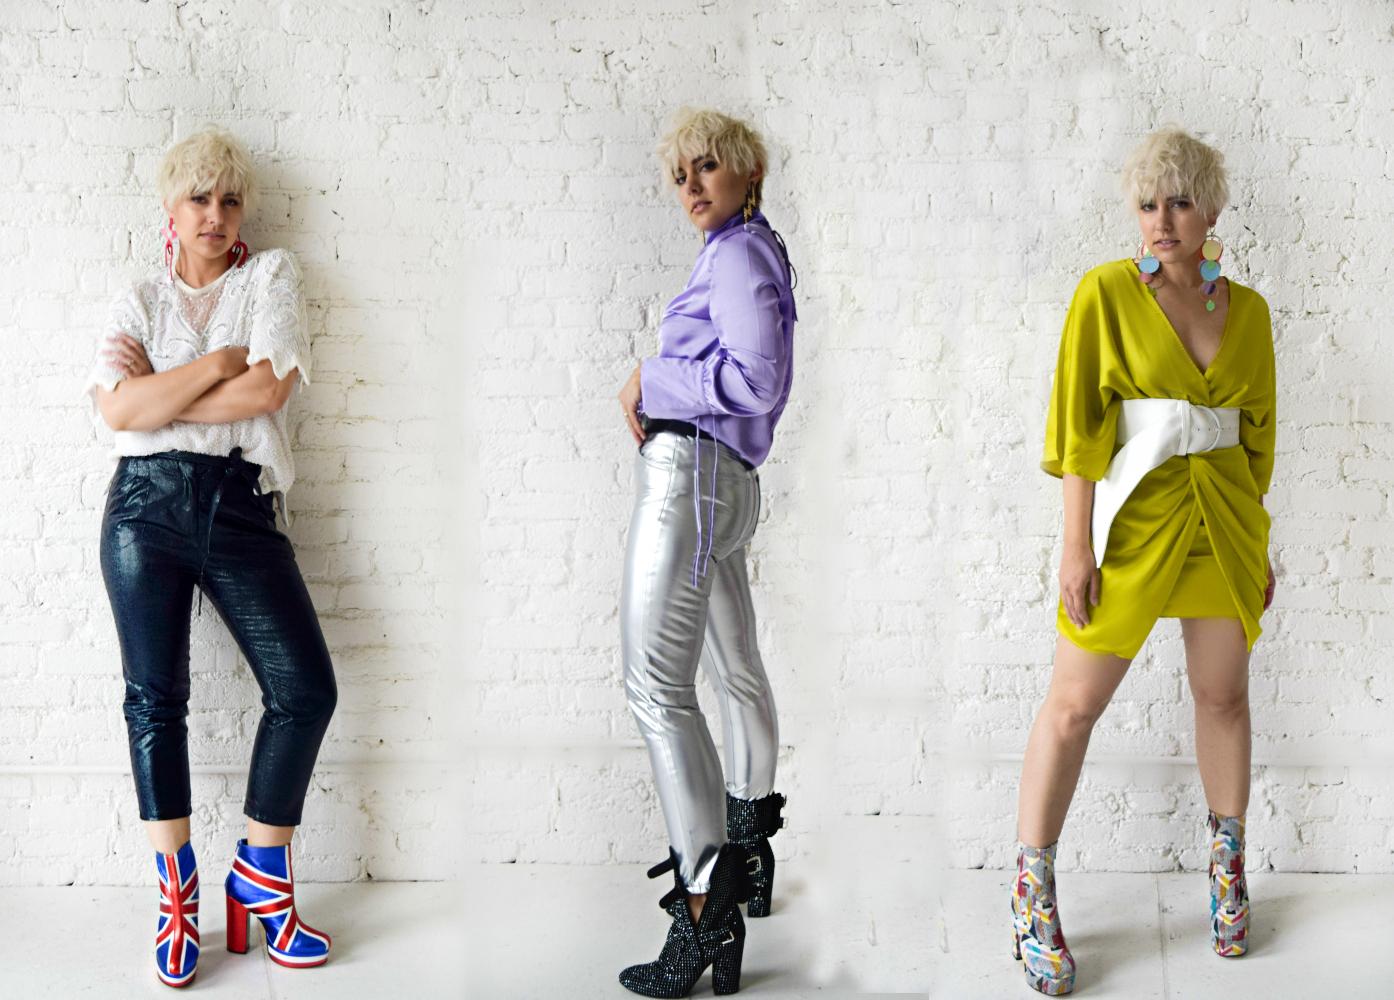 Embracing Your 80's Alter-Ego Using Modern Clothing - BloggerNotBillionaire.com